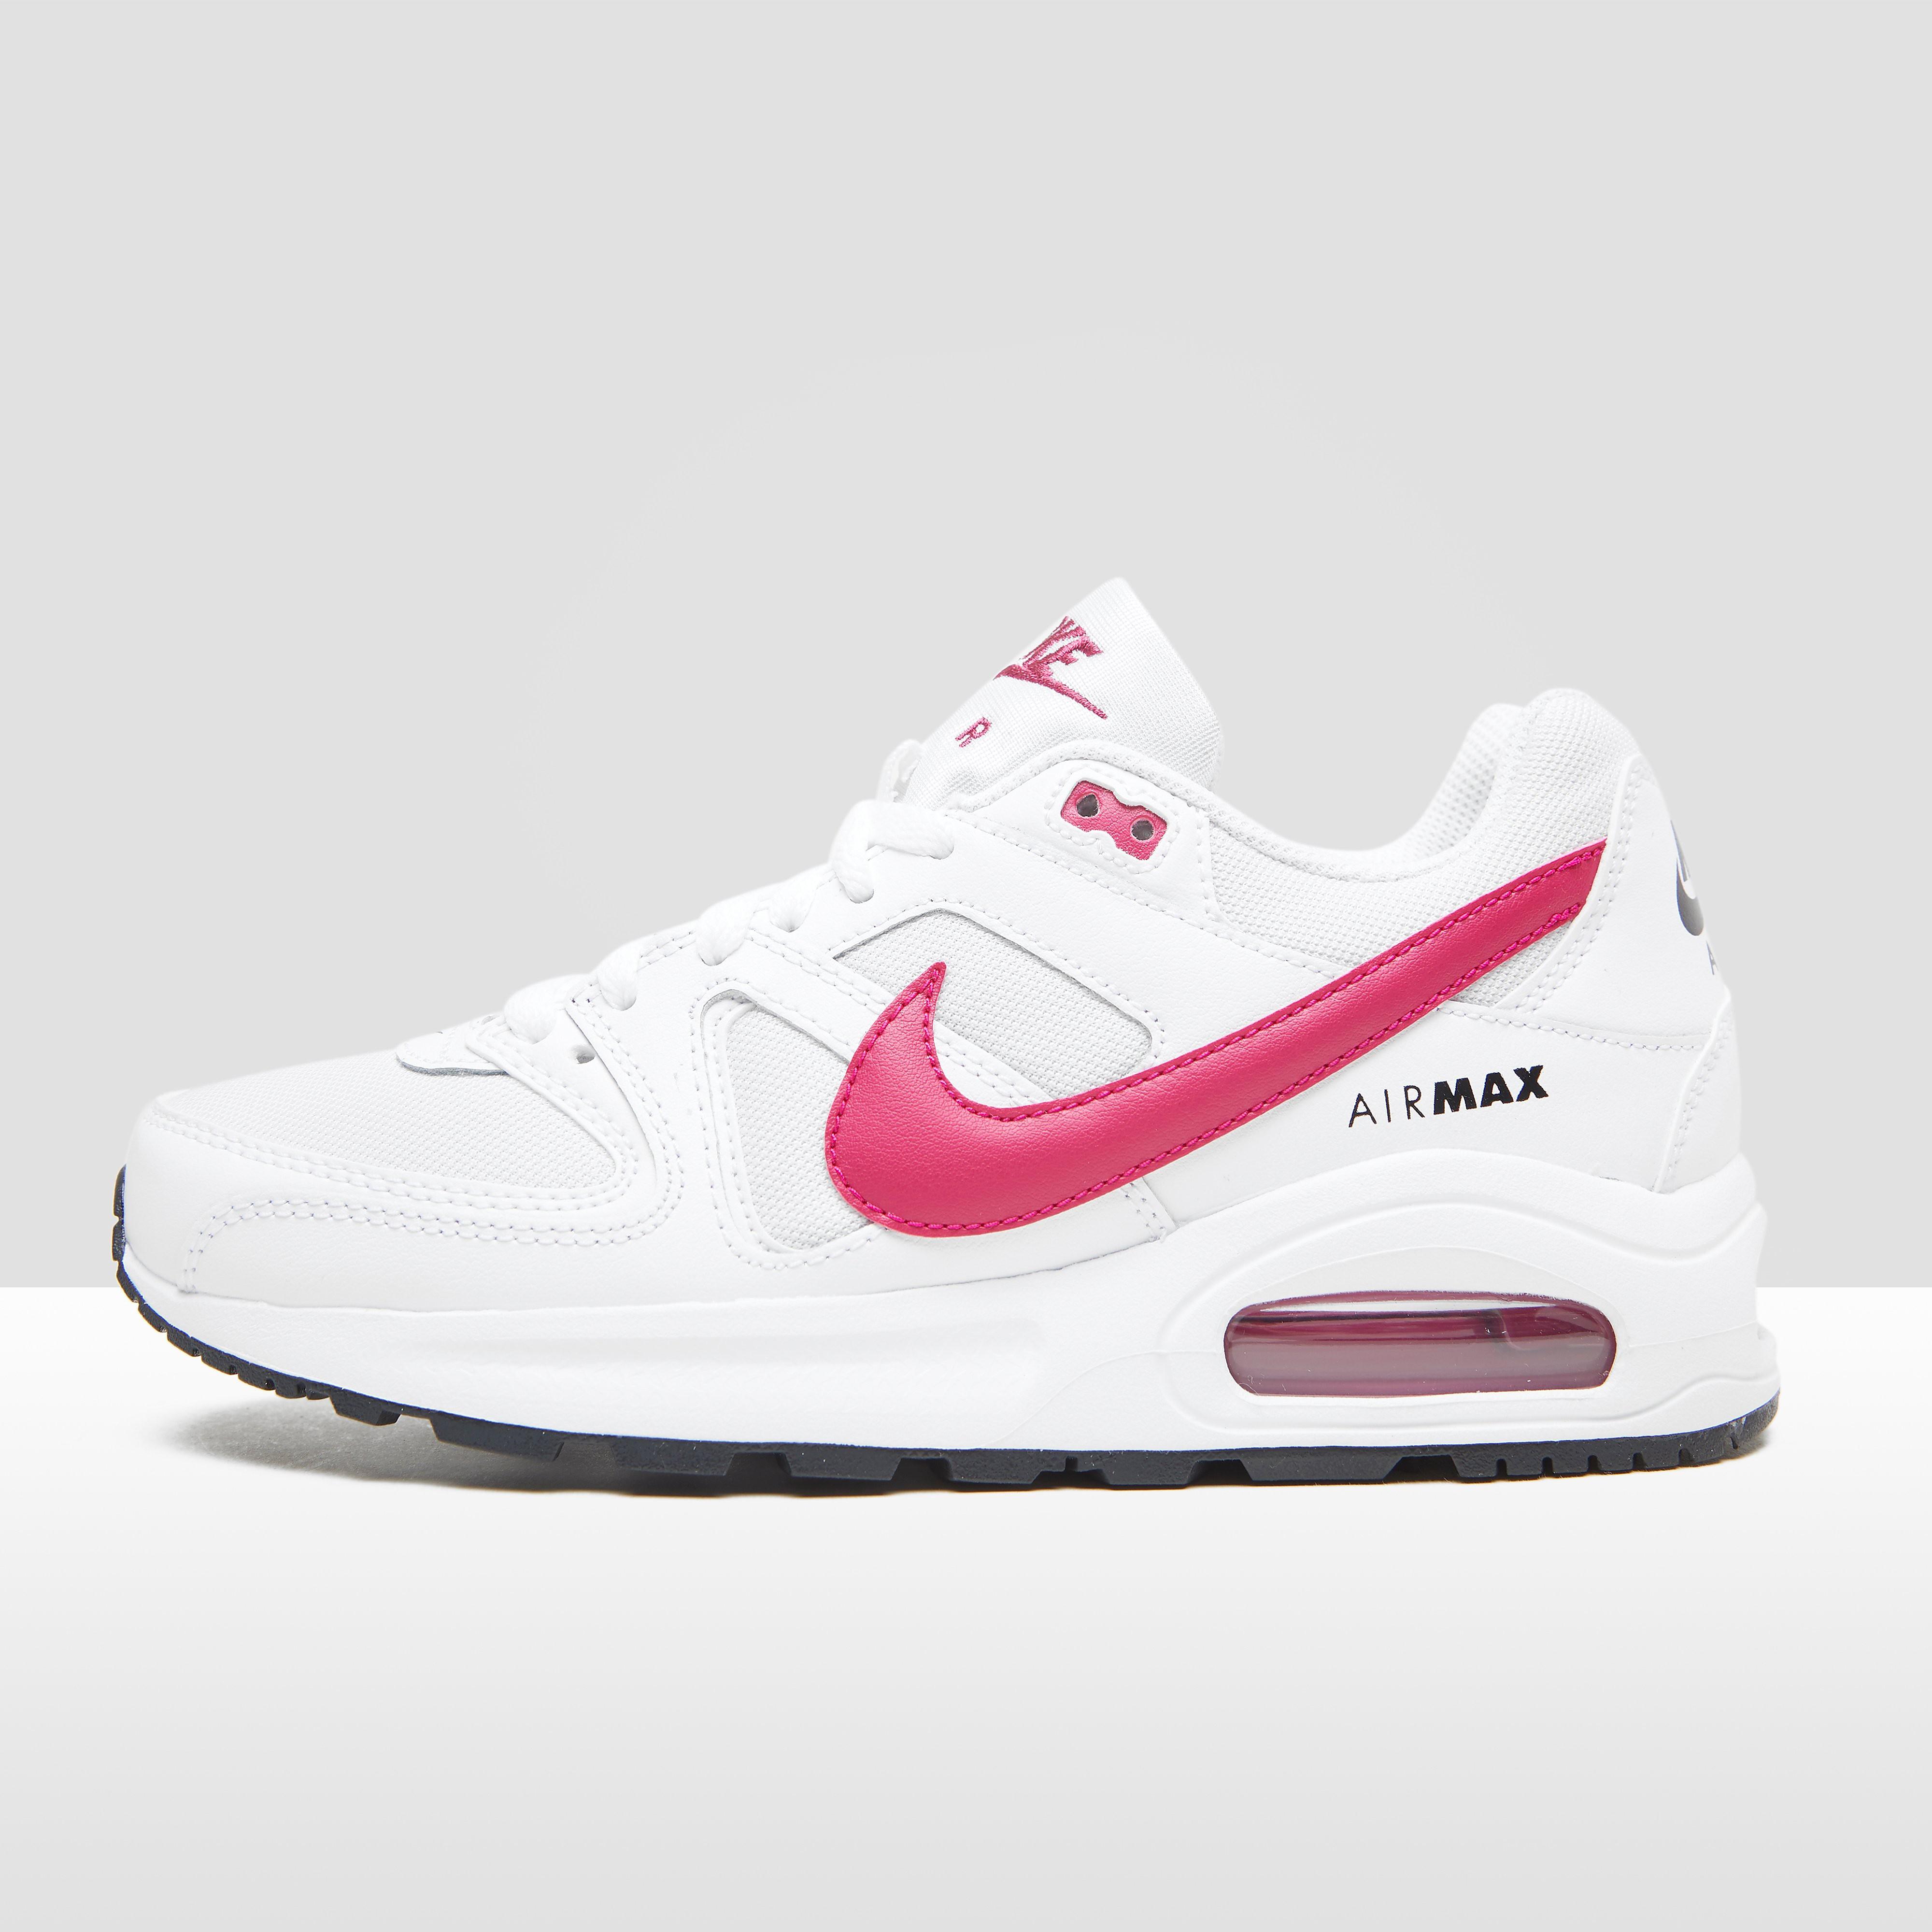 Hardloopschoenen Nike air max command flex (gs) 844349 101